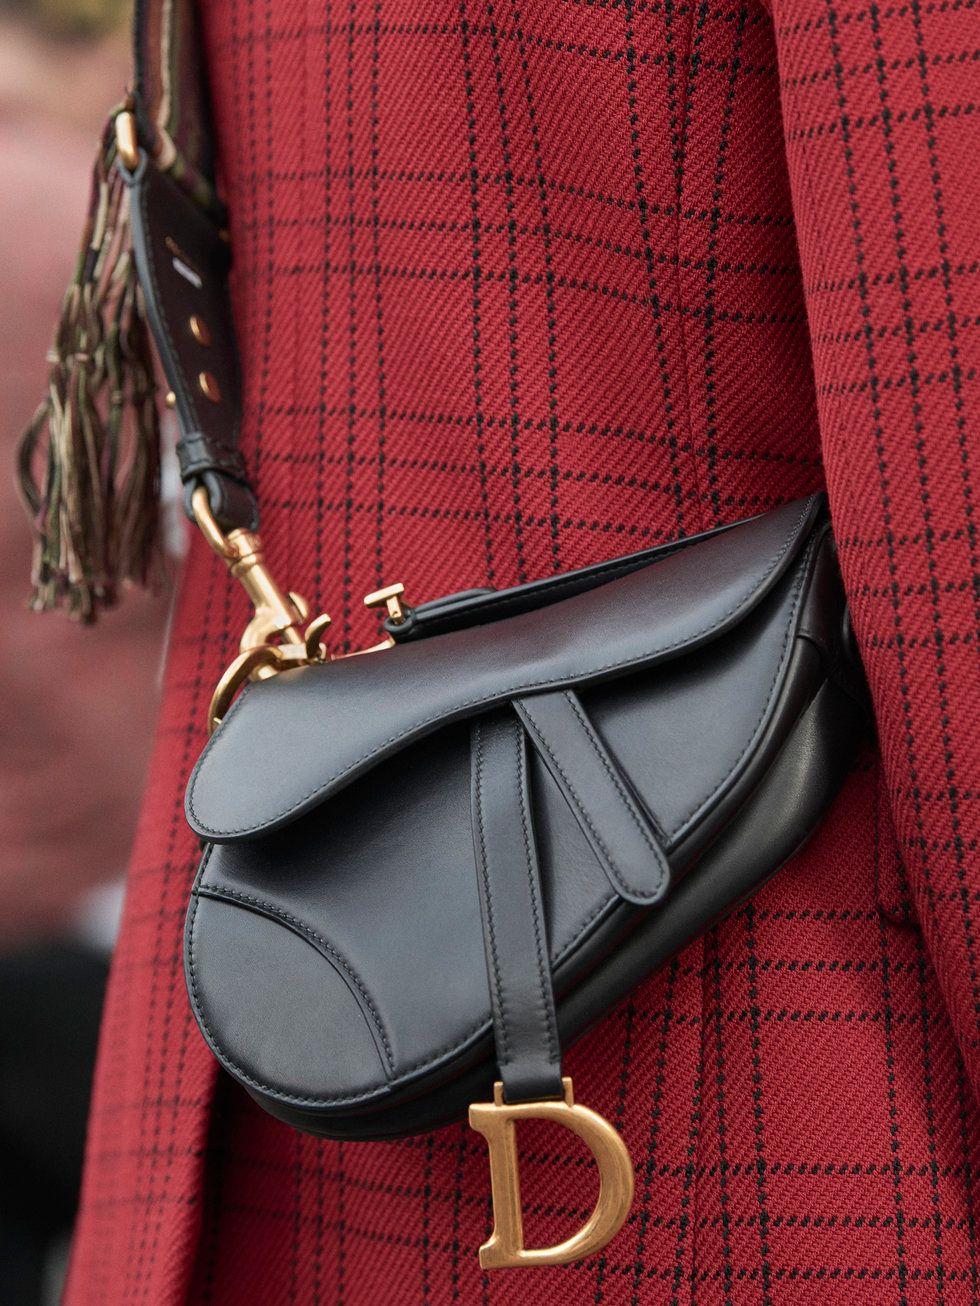 905532c82654 Dior s Iconic Saddle Bag Makes a Comeback - PAPER